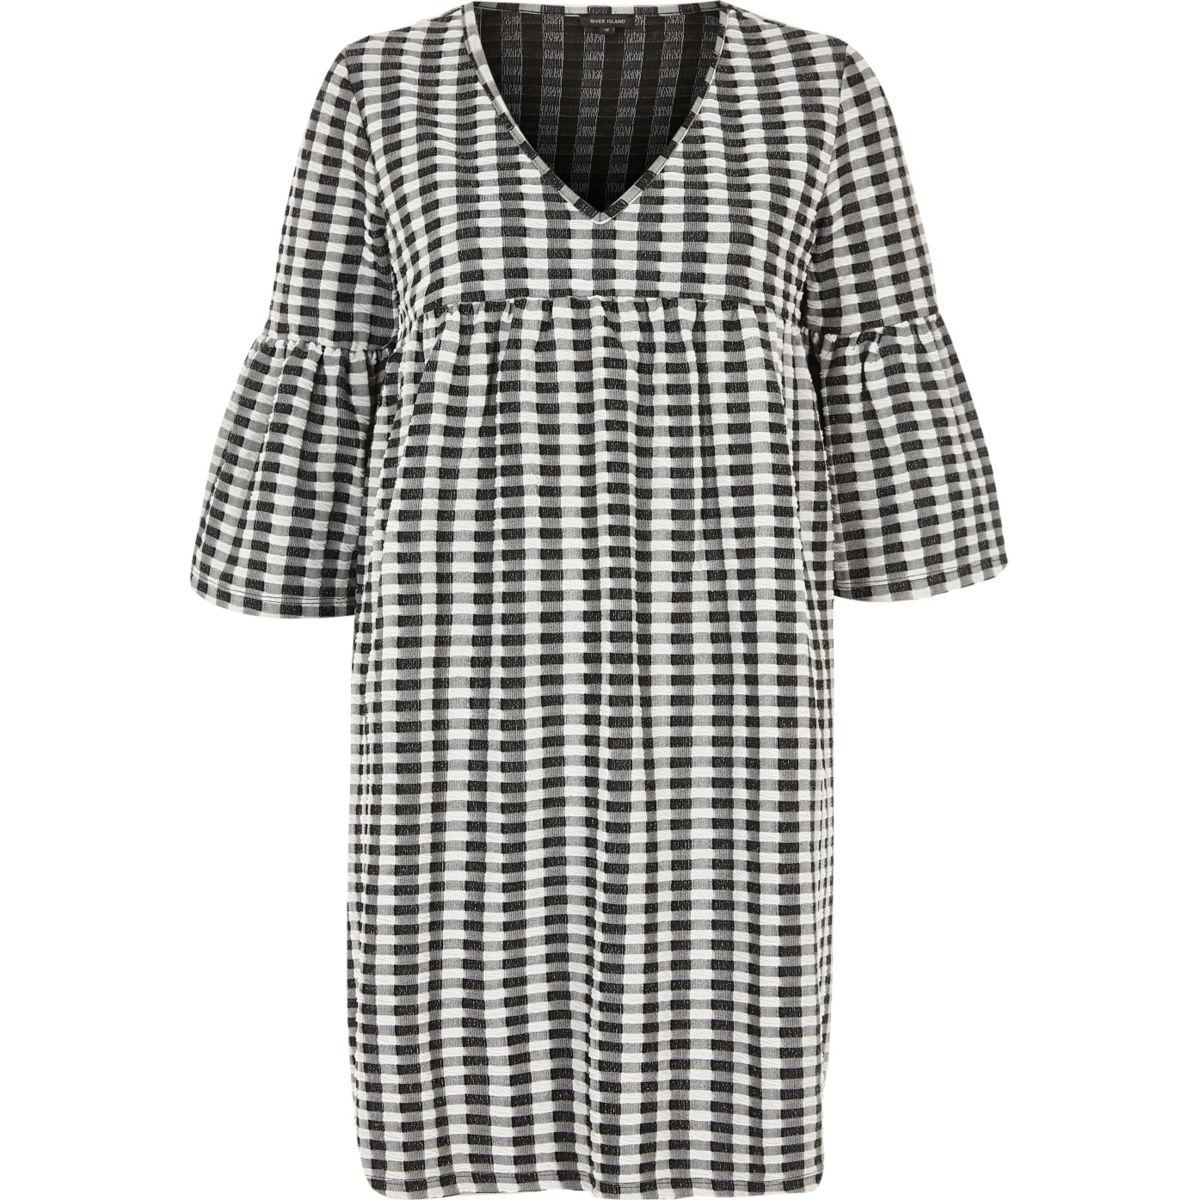 Black and cream gingham smock dress